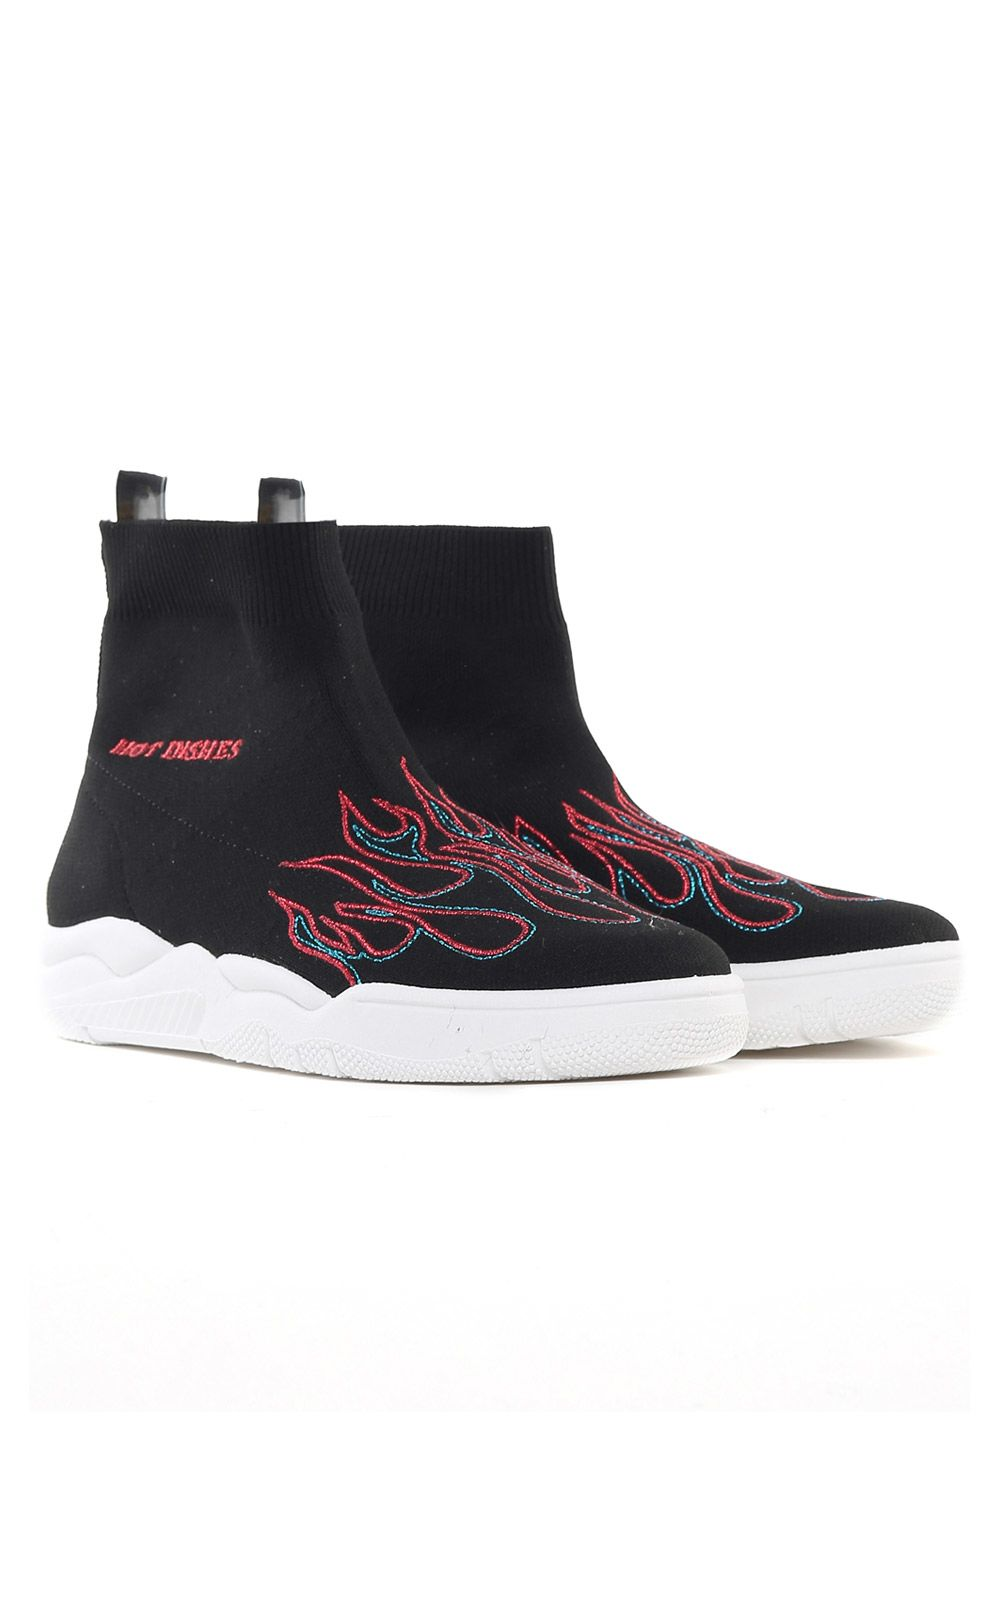 Flame stretch-knit sock sneakers Chiara Ferragni lgienkbn